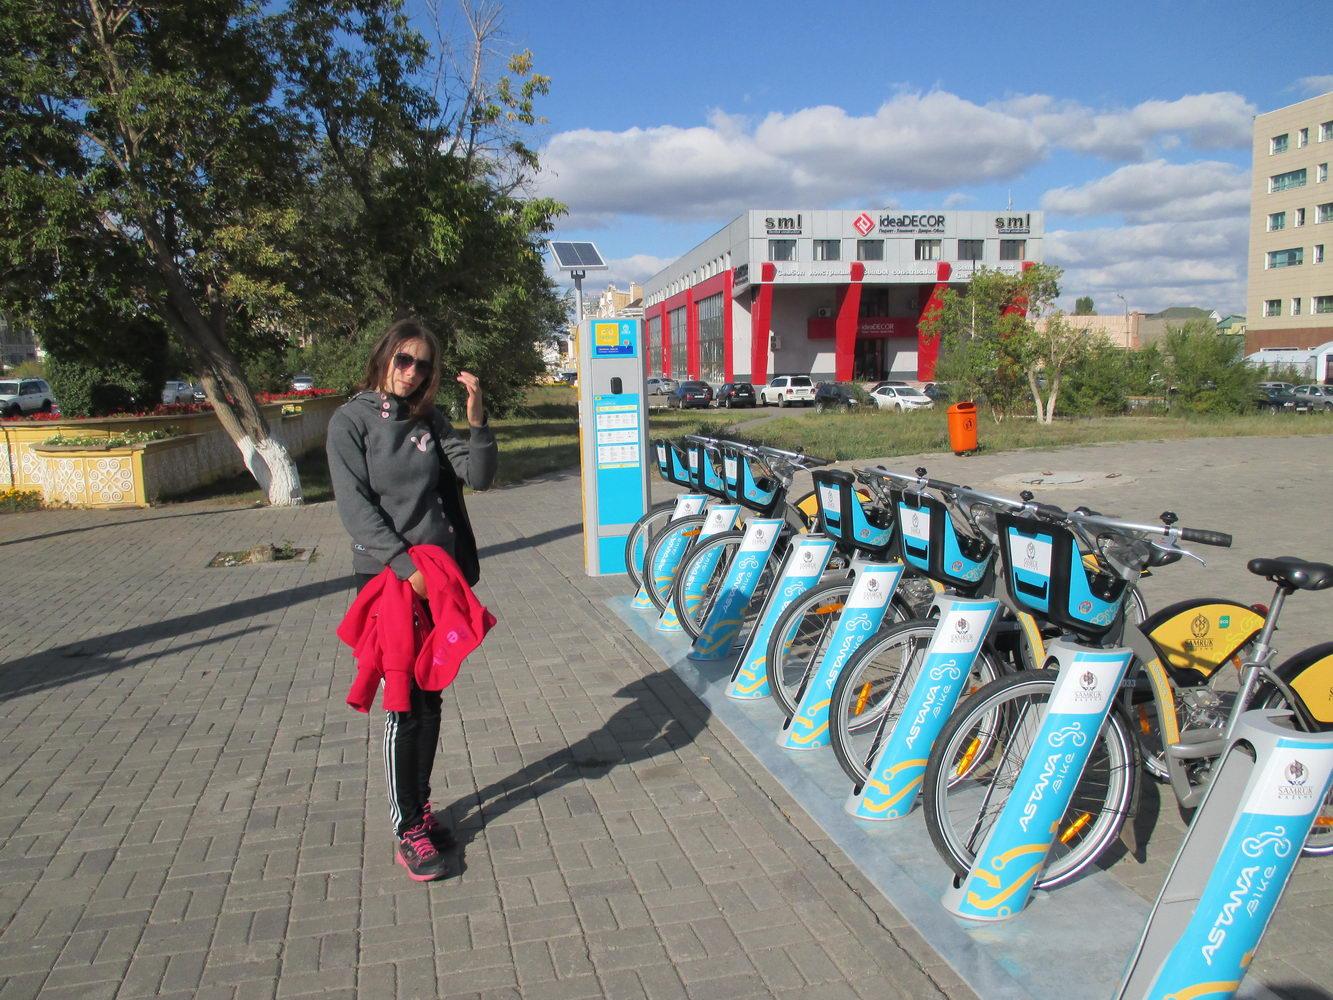 велосипеды на прокат. парк. астана. казахстан